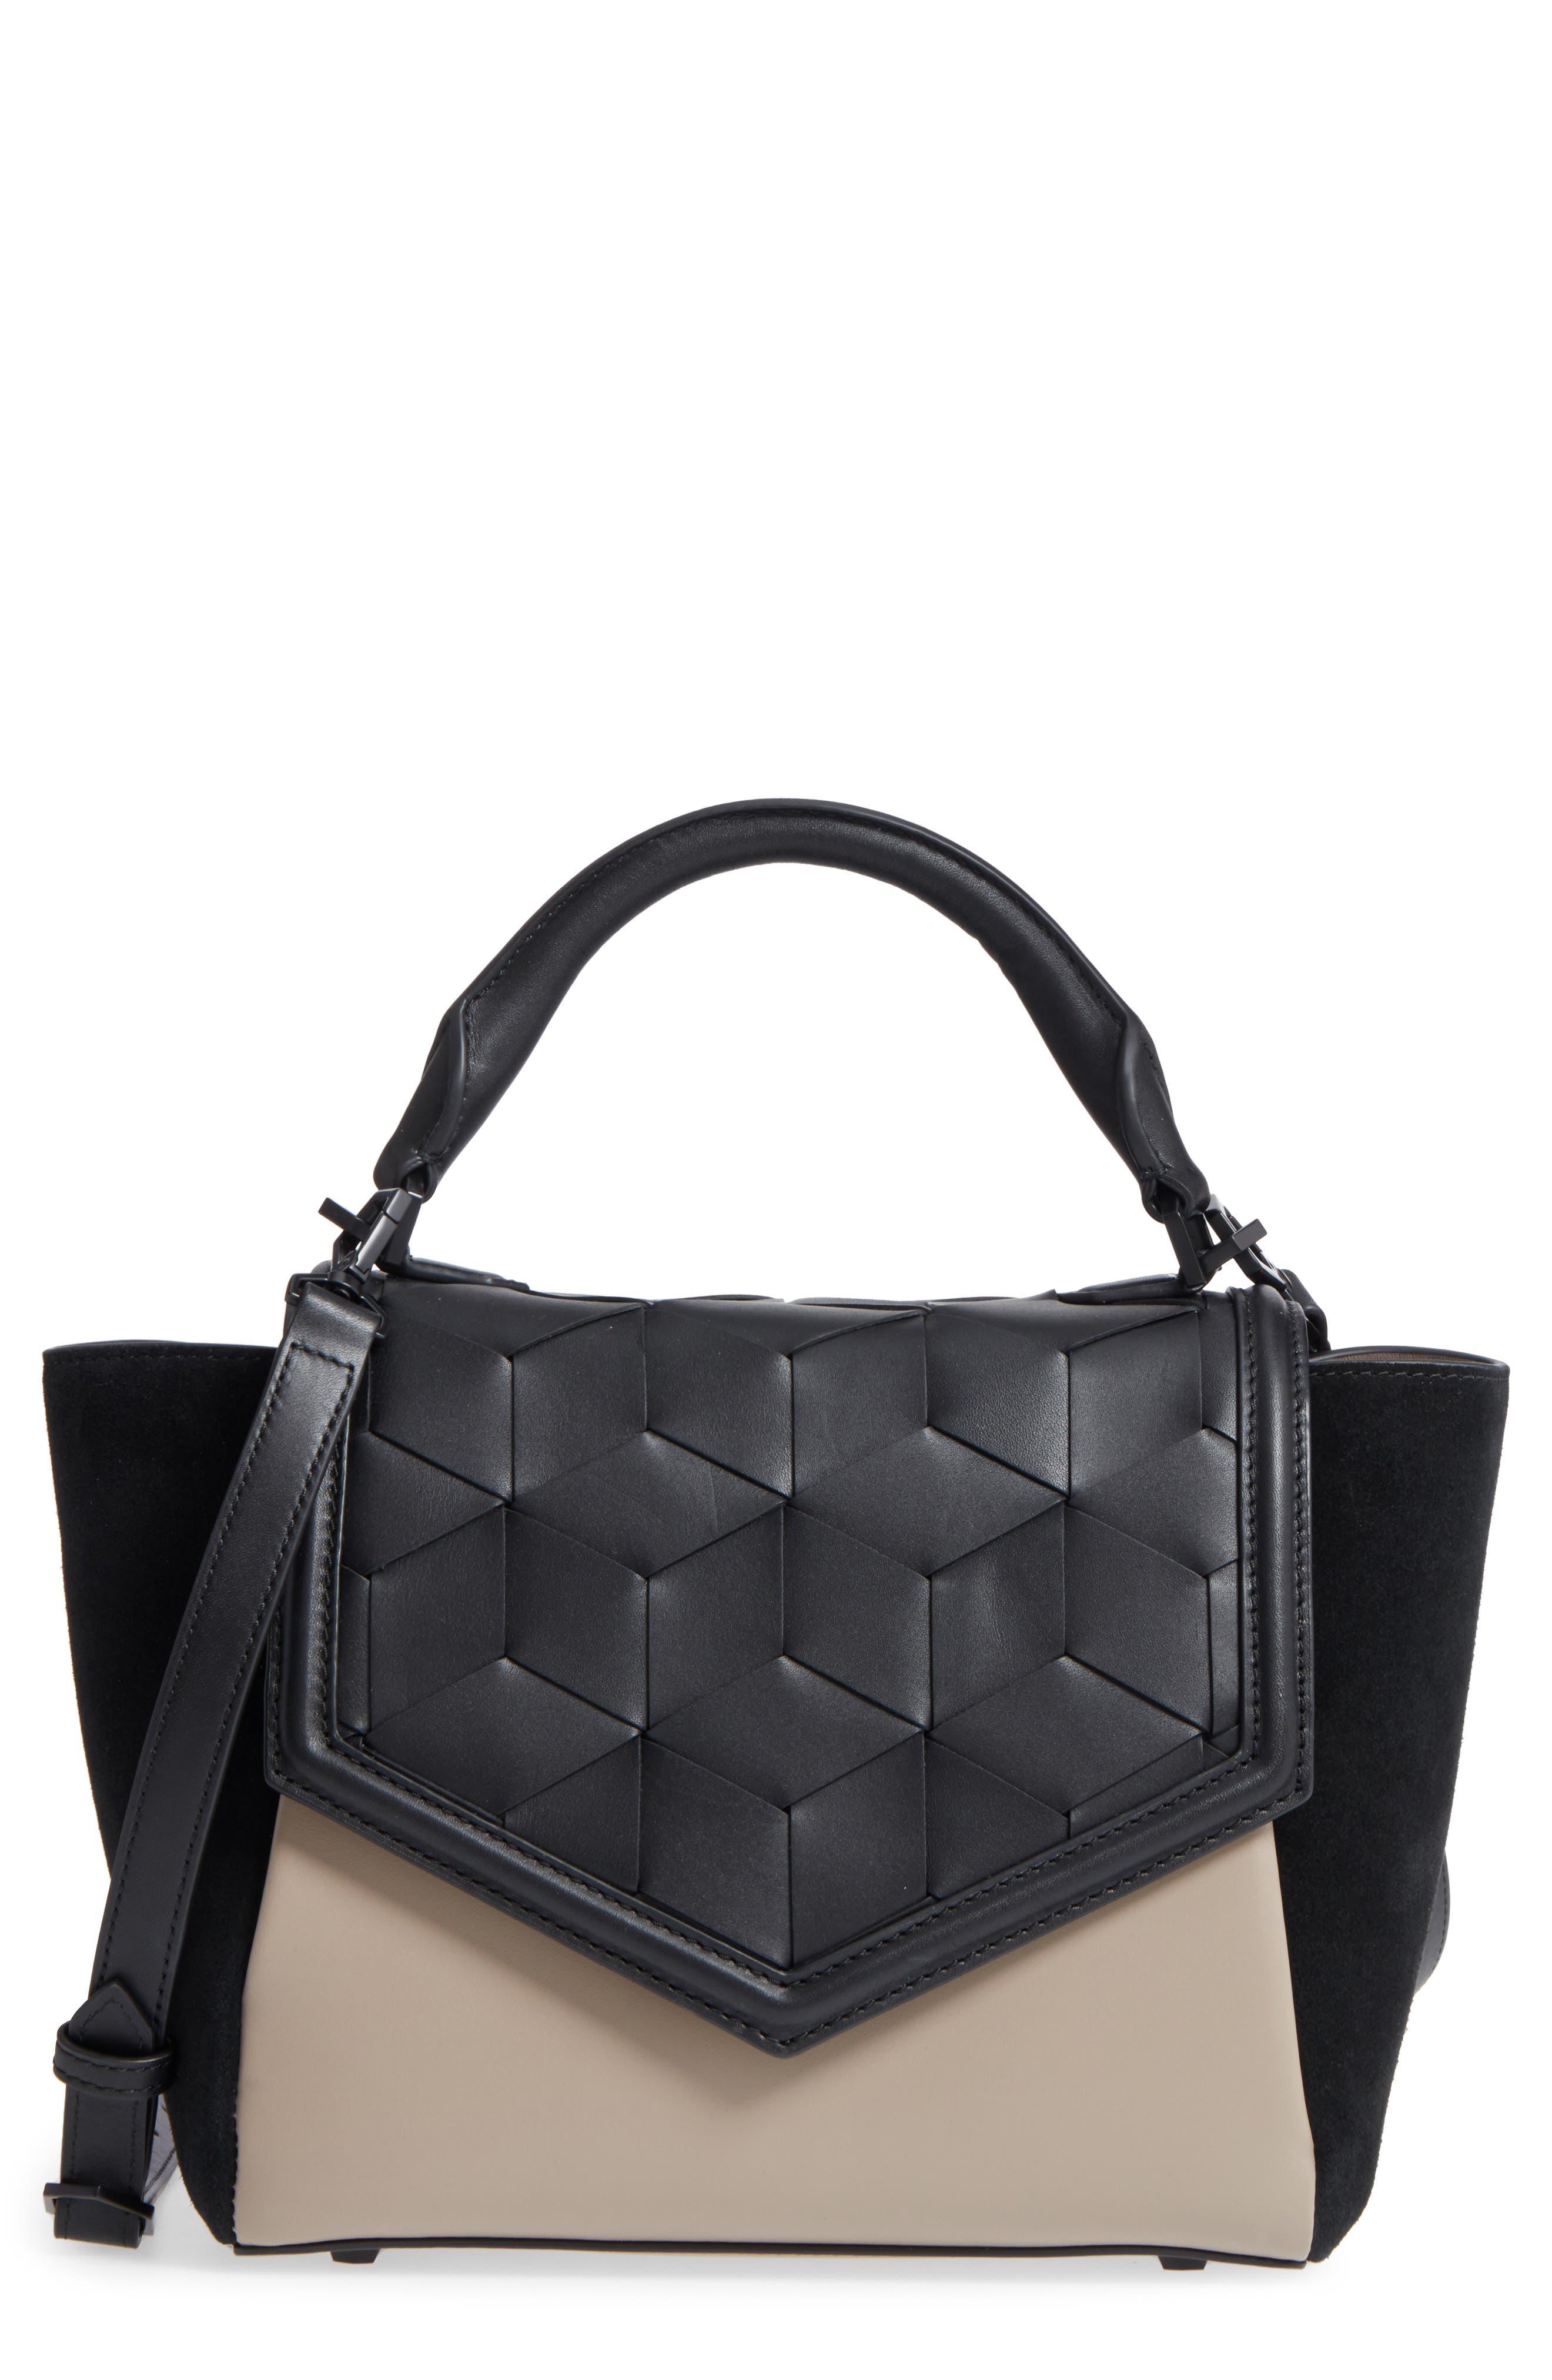 Alternate Image 1 Selected - WELDEN Small Saunter Colorblocked Leather & Suede Top Handle Satchel